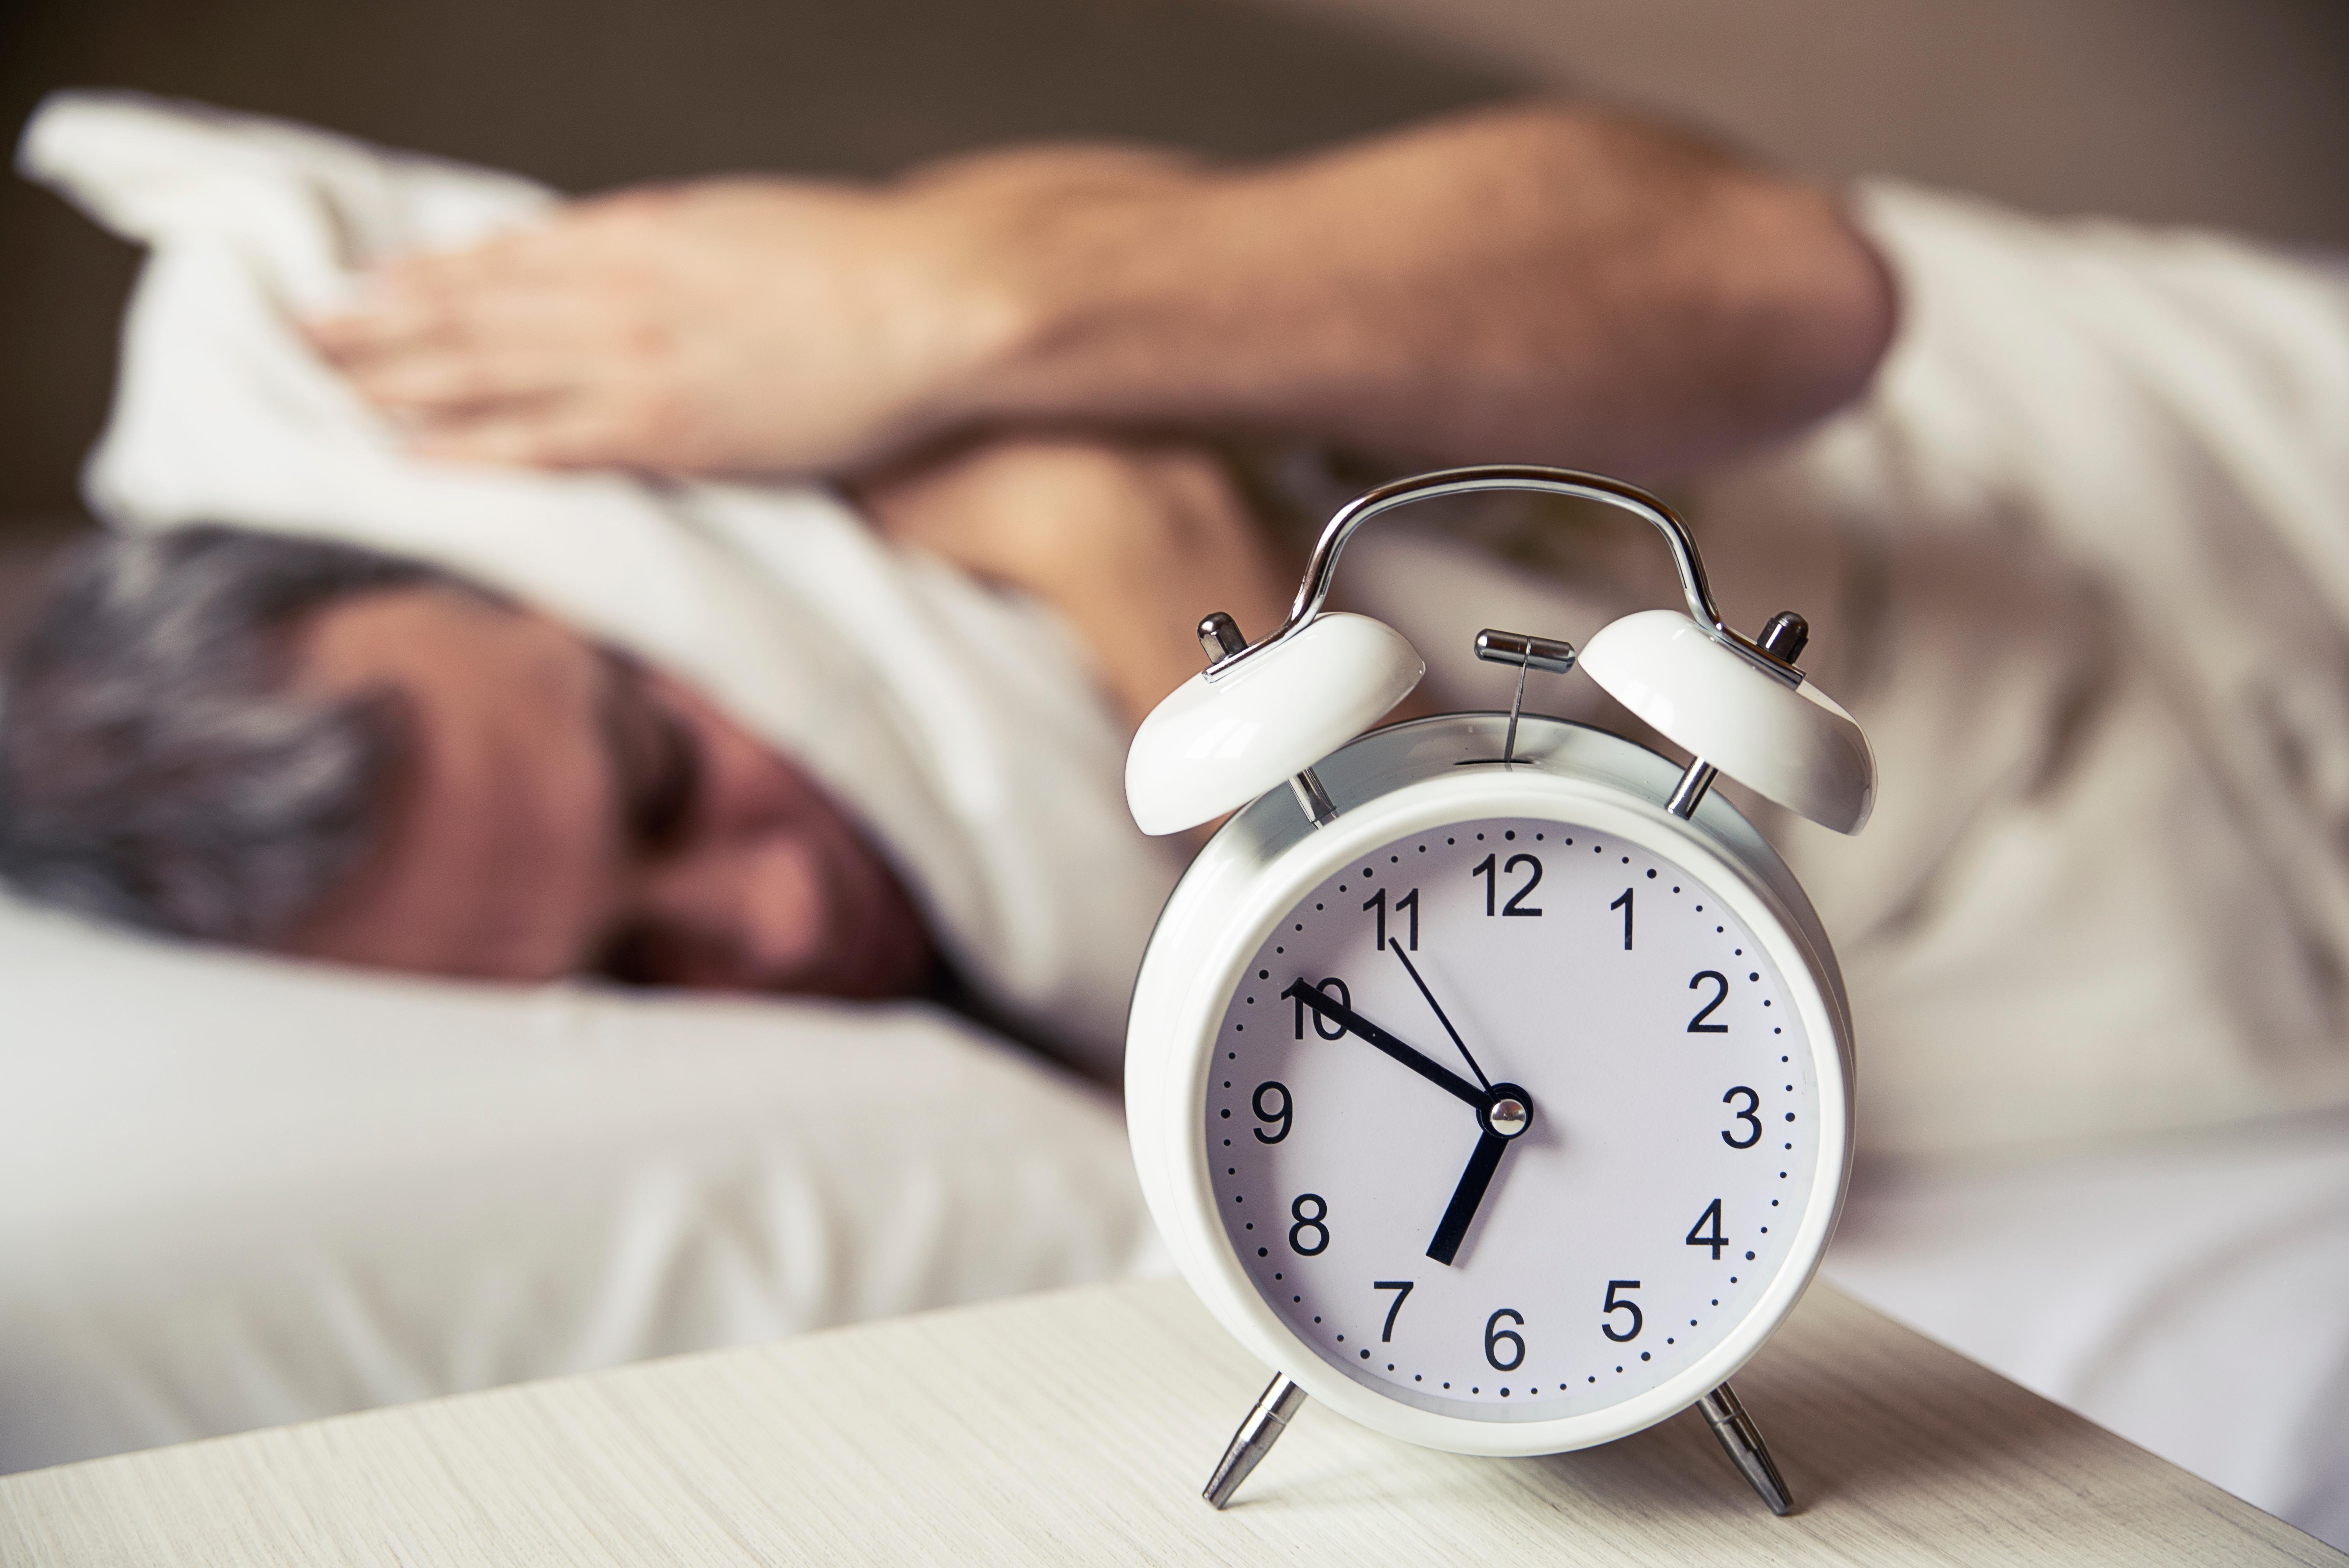 Type 1 Diabetes And Sleep Deprivation